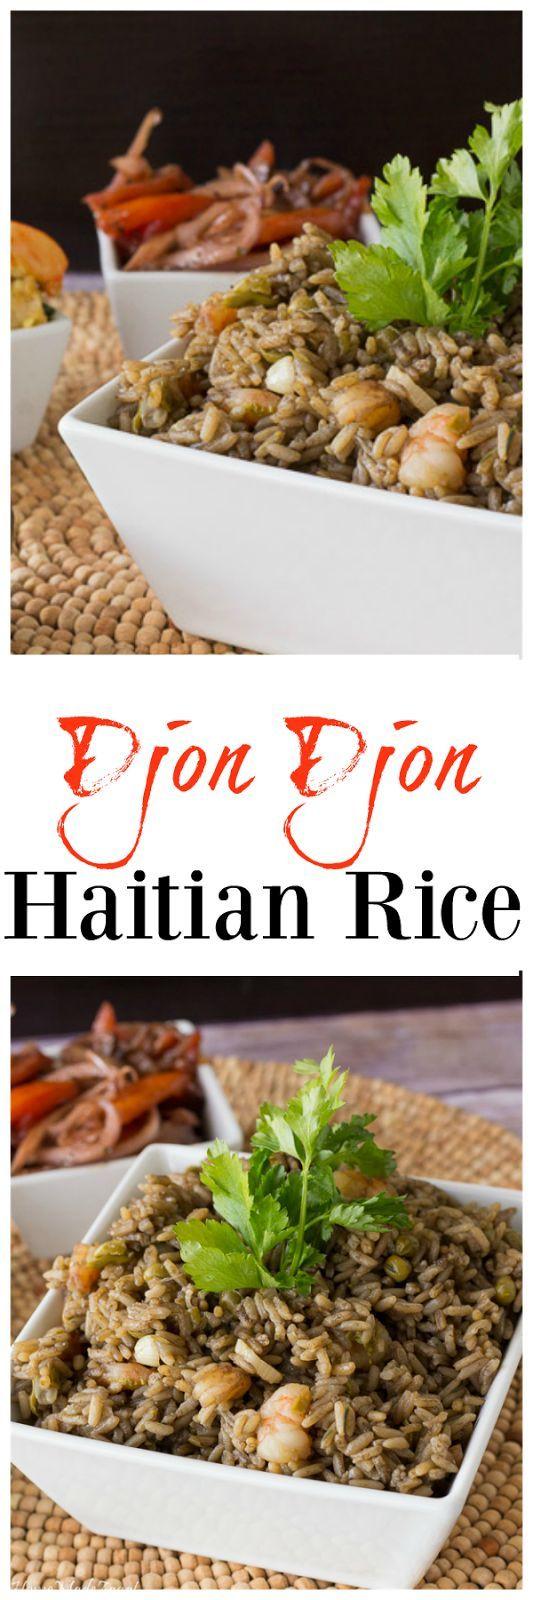 Djon Djon - Haitian Rice: A savory Haitian rice dish, deeply flavored with black mushrooms. A great addition to dinner. #HomeMadeZagat